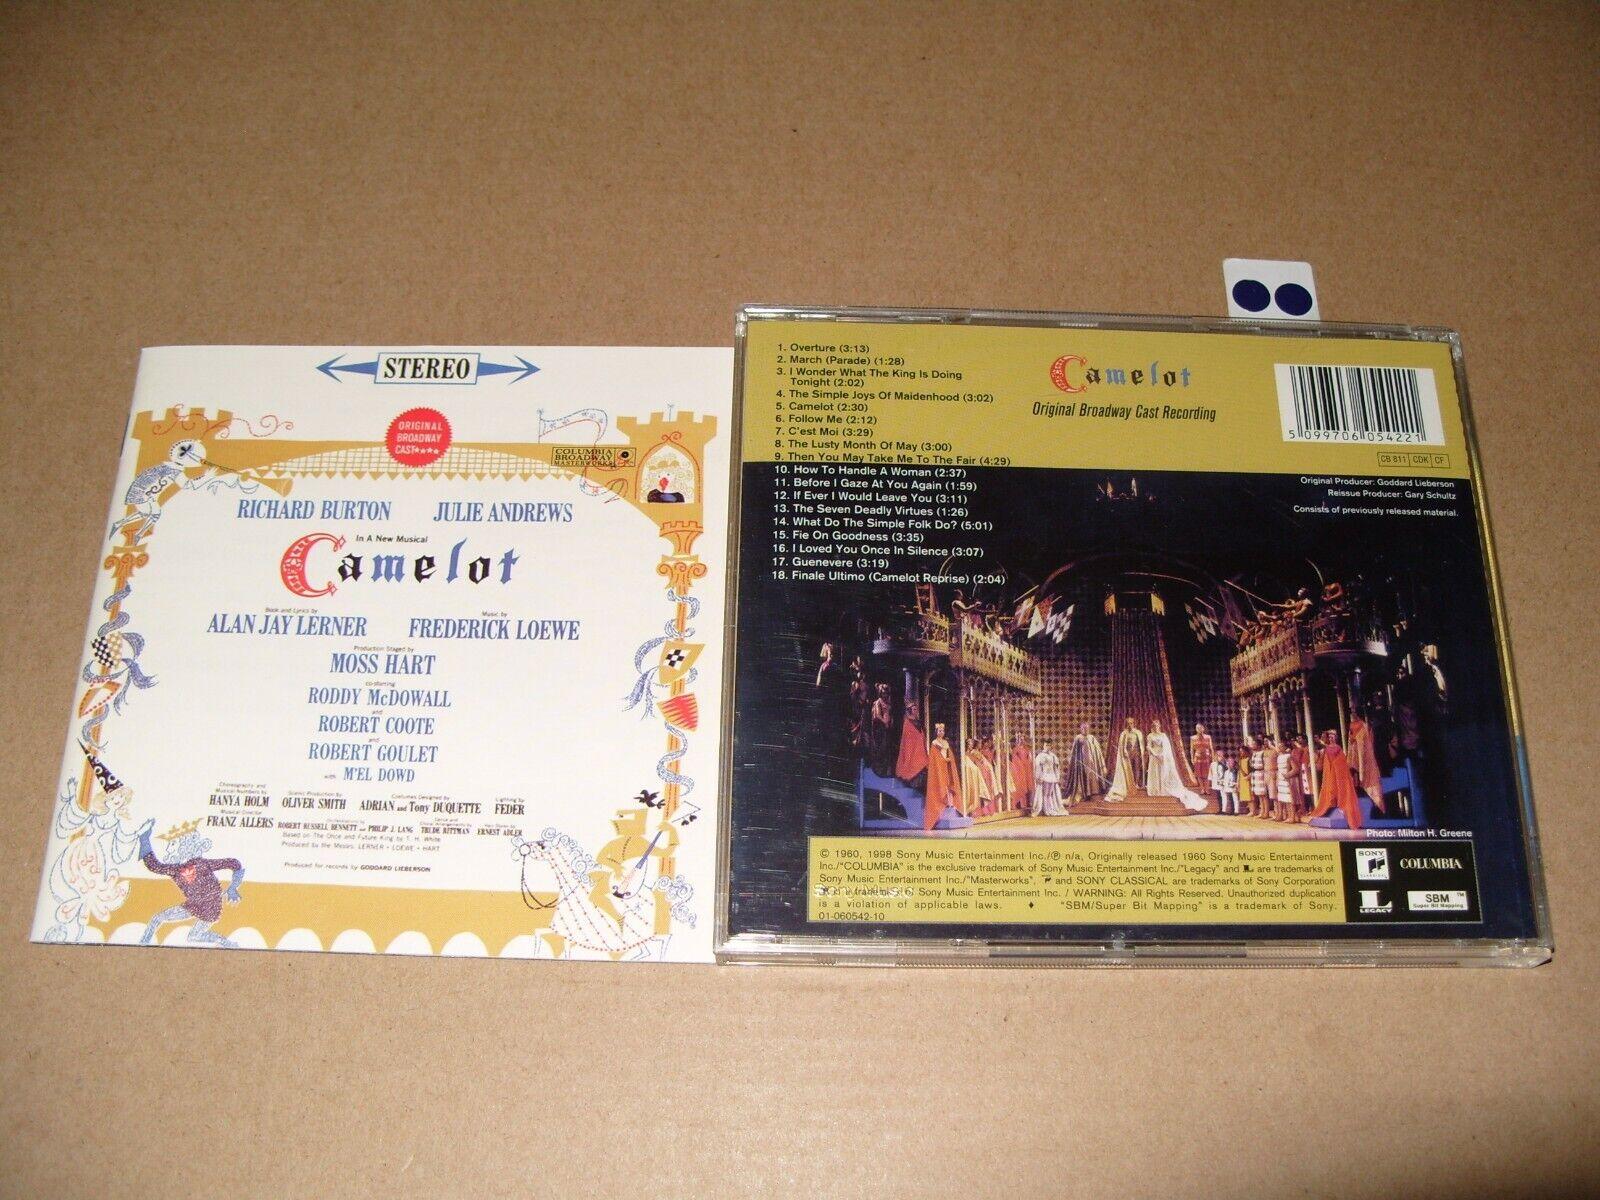 Soundtrack - Camelot [Original Broadway Cast Recording] [Remastered] (1998)